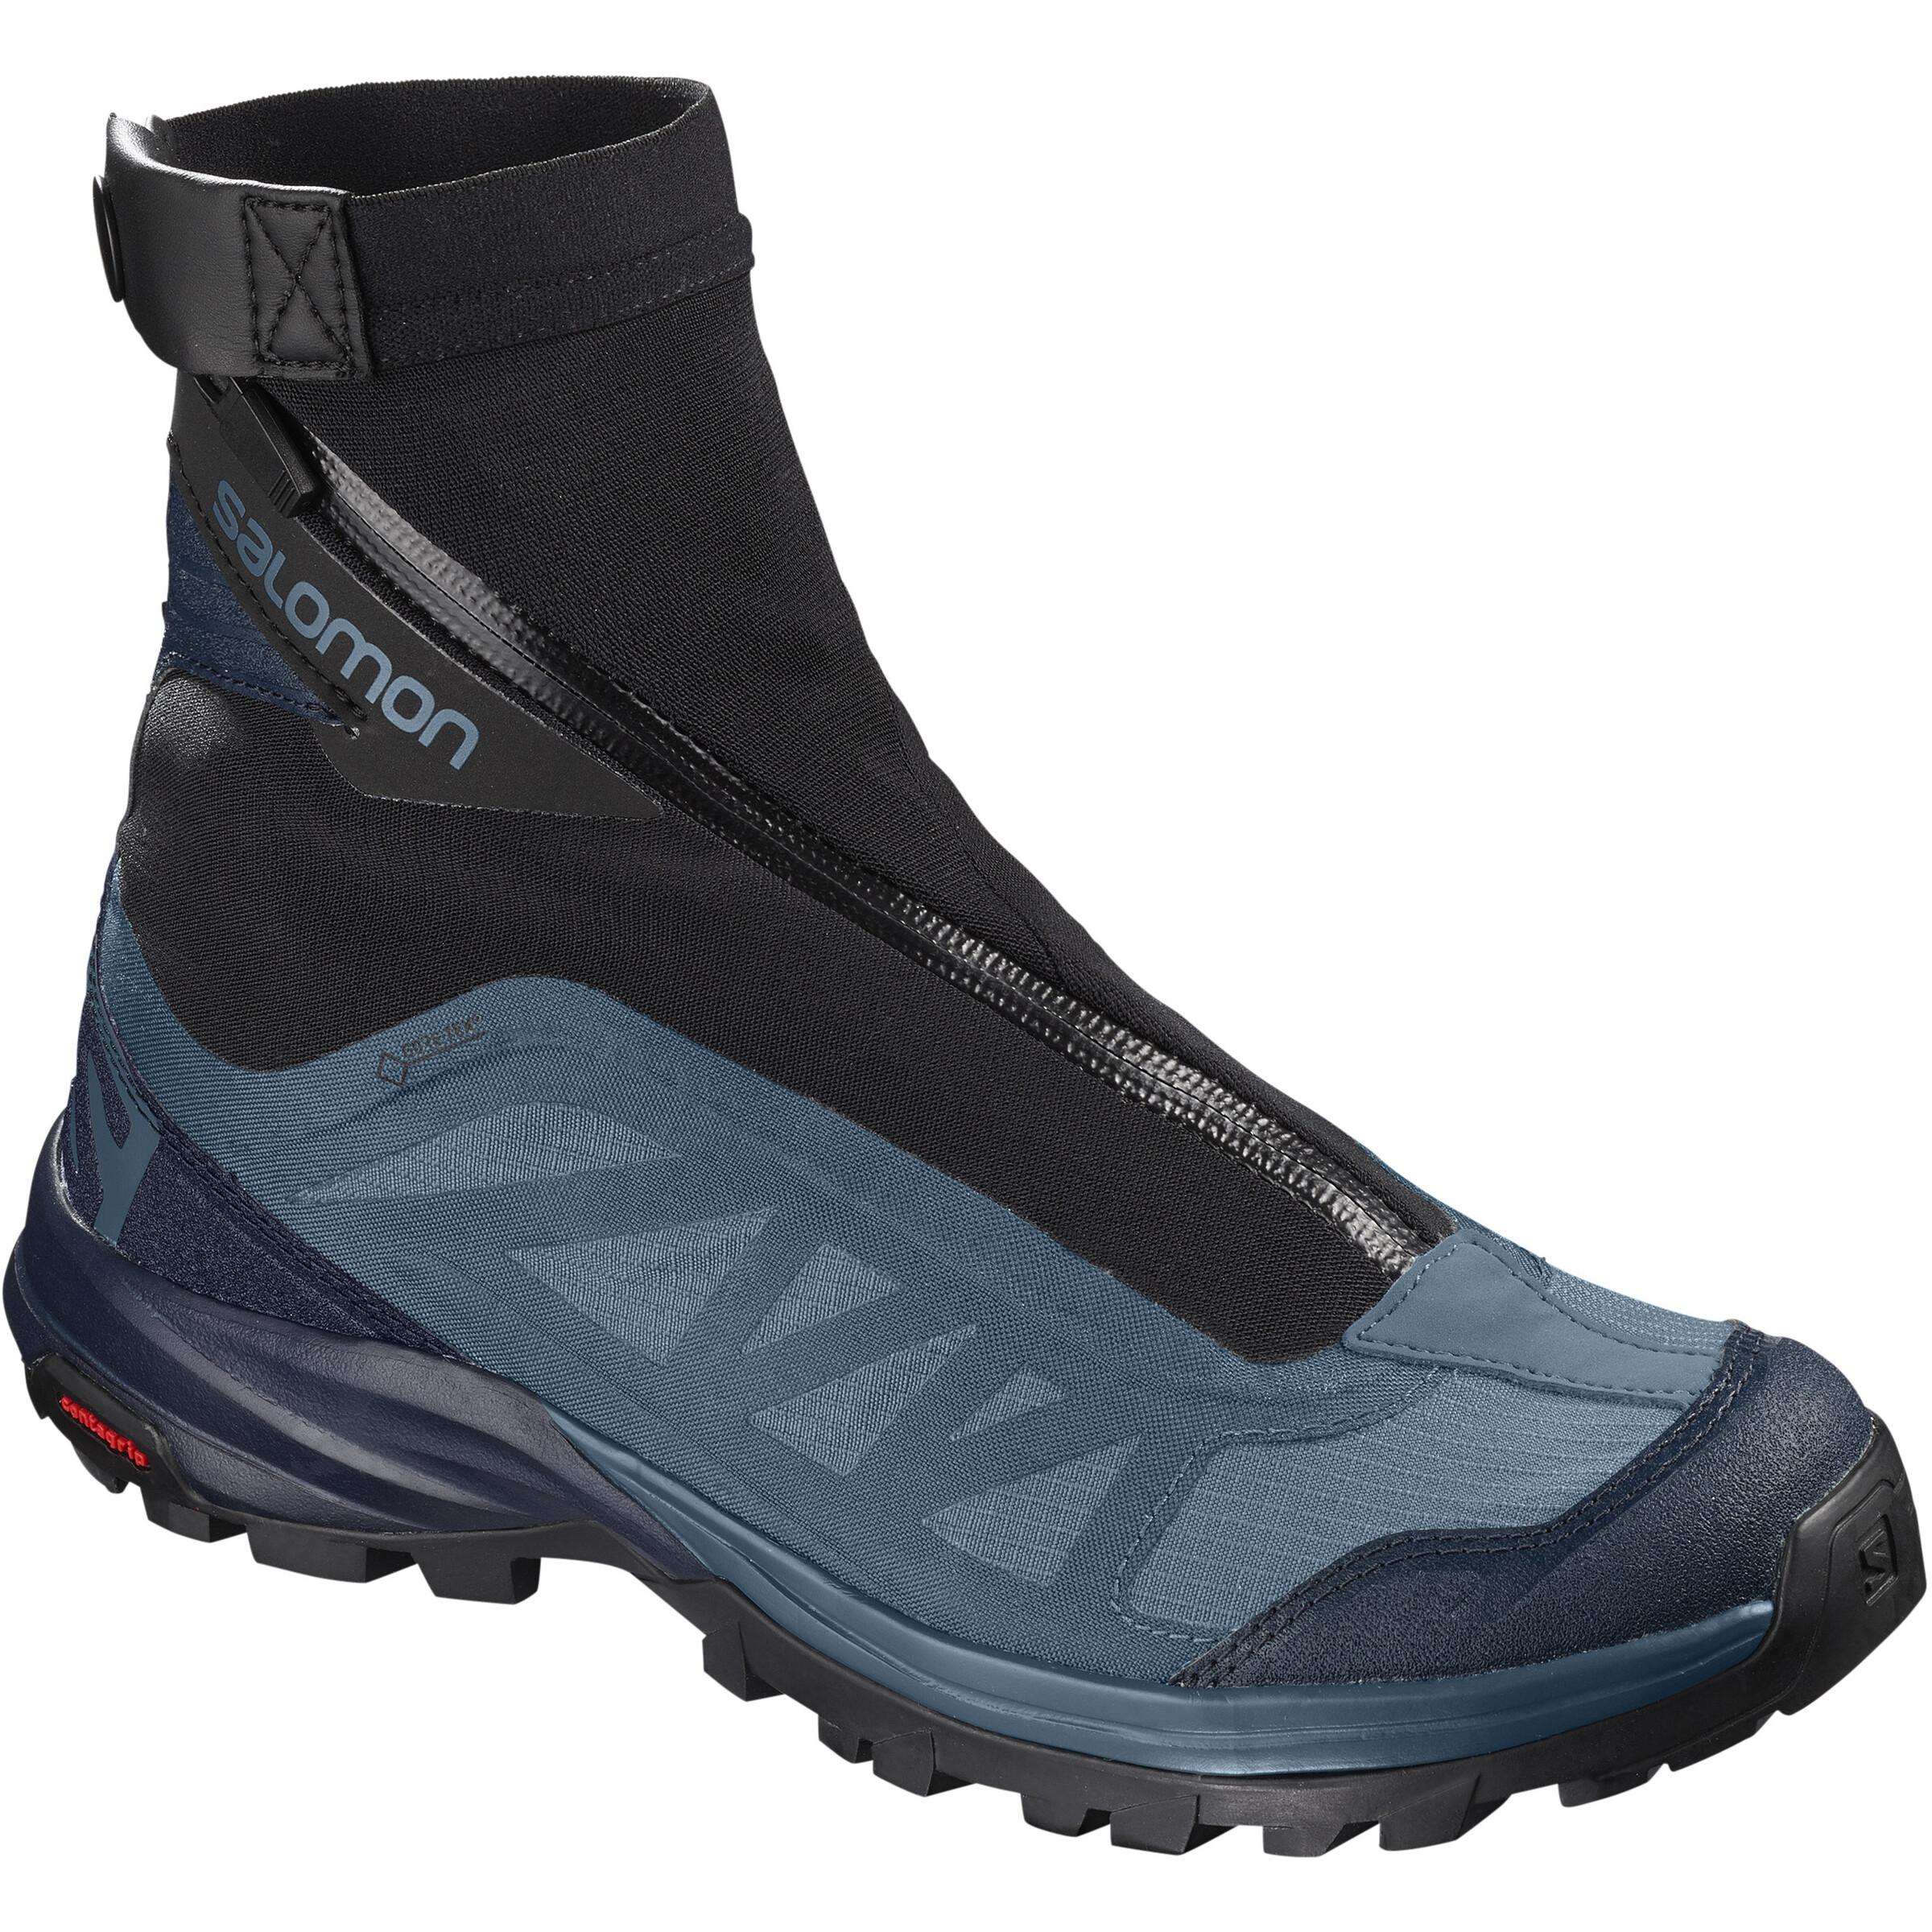 salomon-outpath-pro-gtx-shoes-dam-mallard-blue-navy-blazer-black-1.jpg